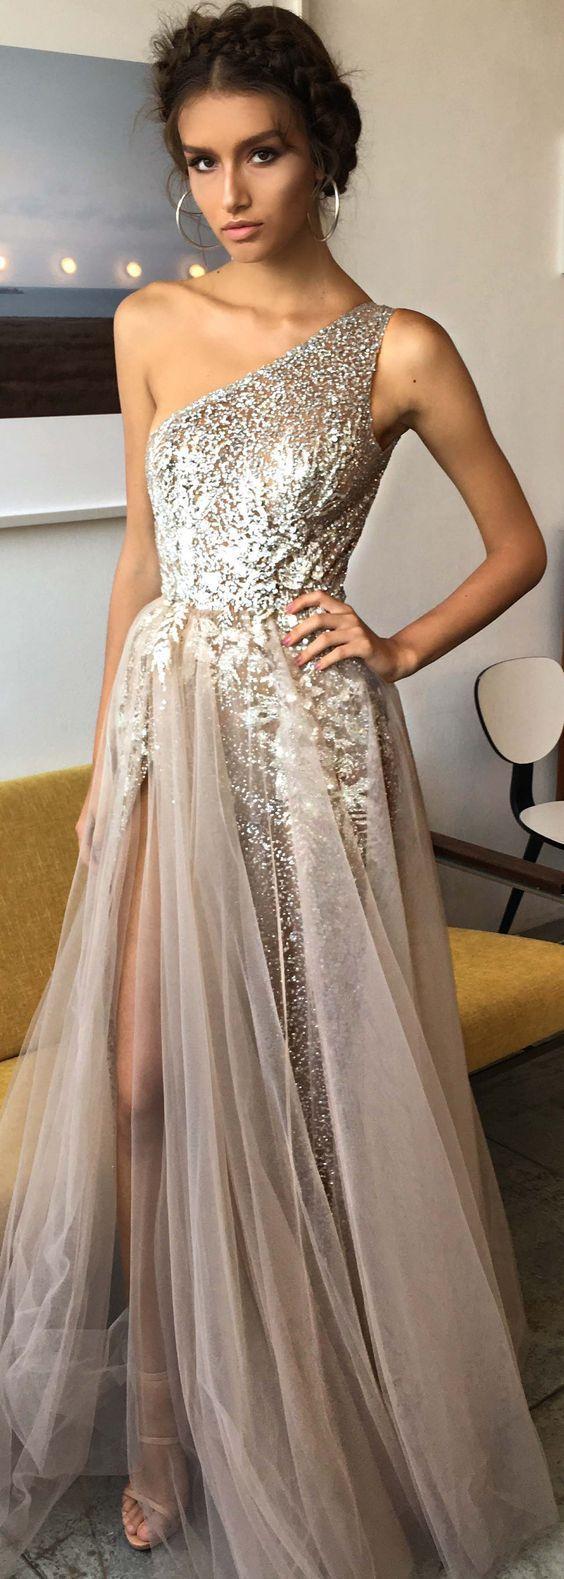 One shoulder shinning side split elegant long prom dresses m